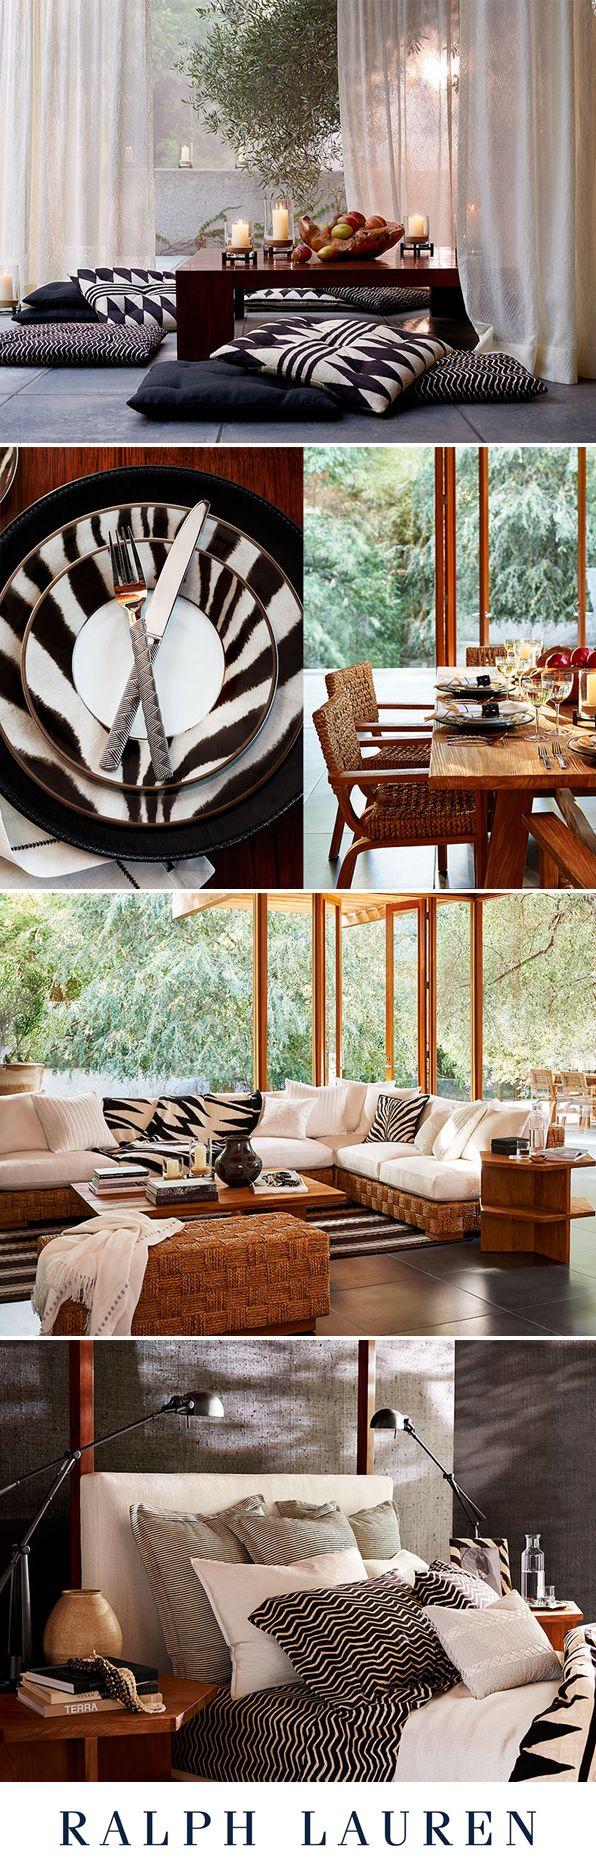 179 best ralph lauren hone decor images on pinterest home ralph lauren